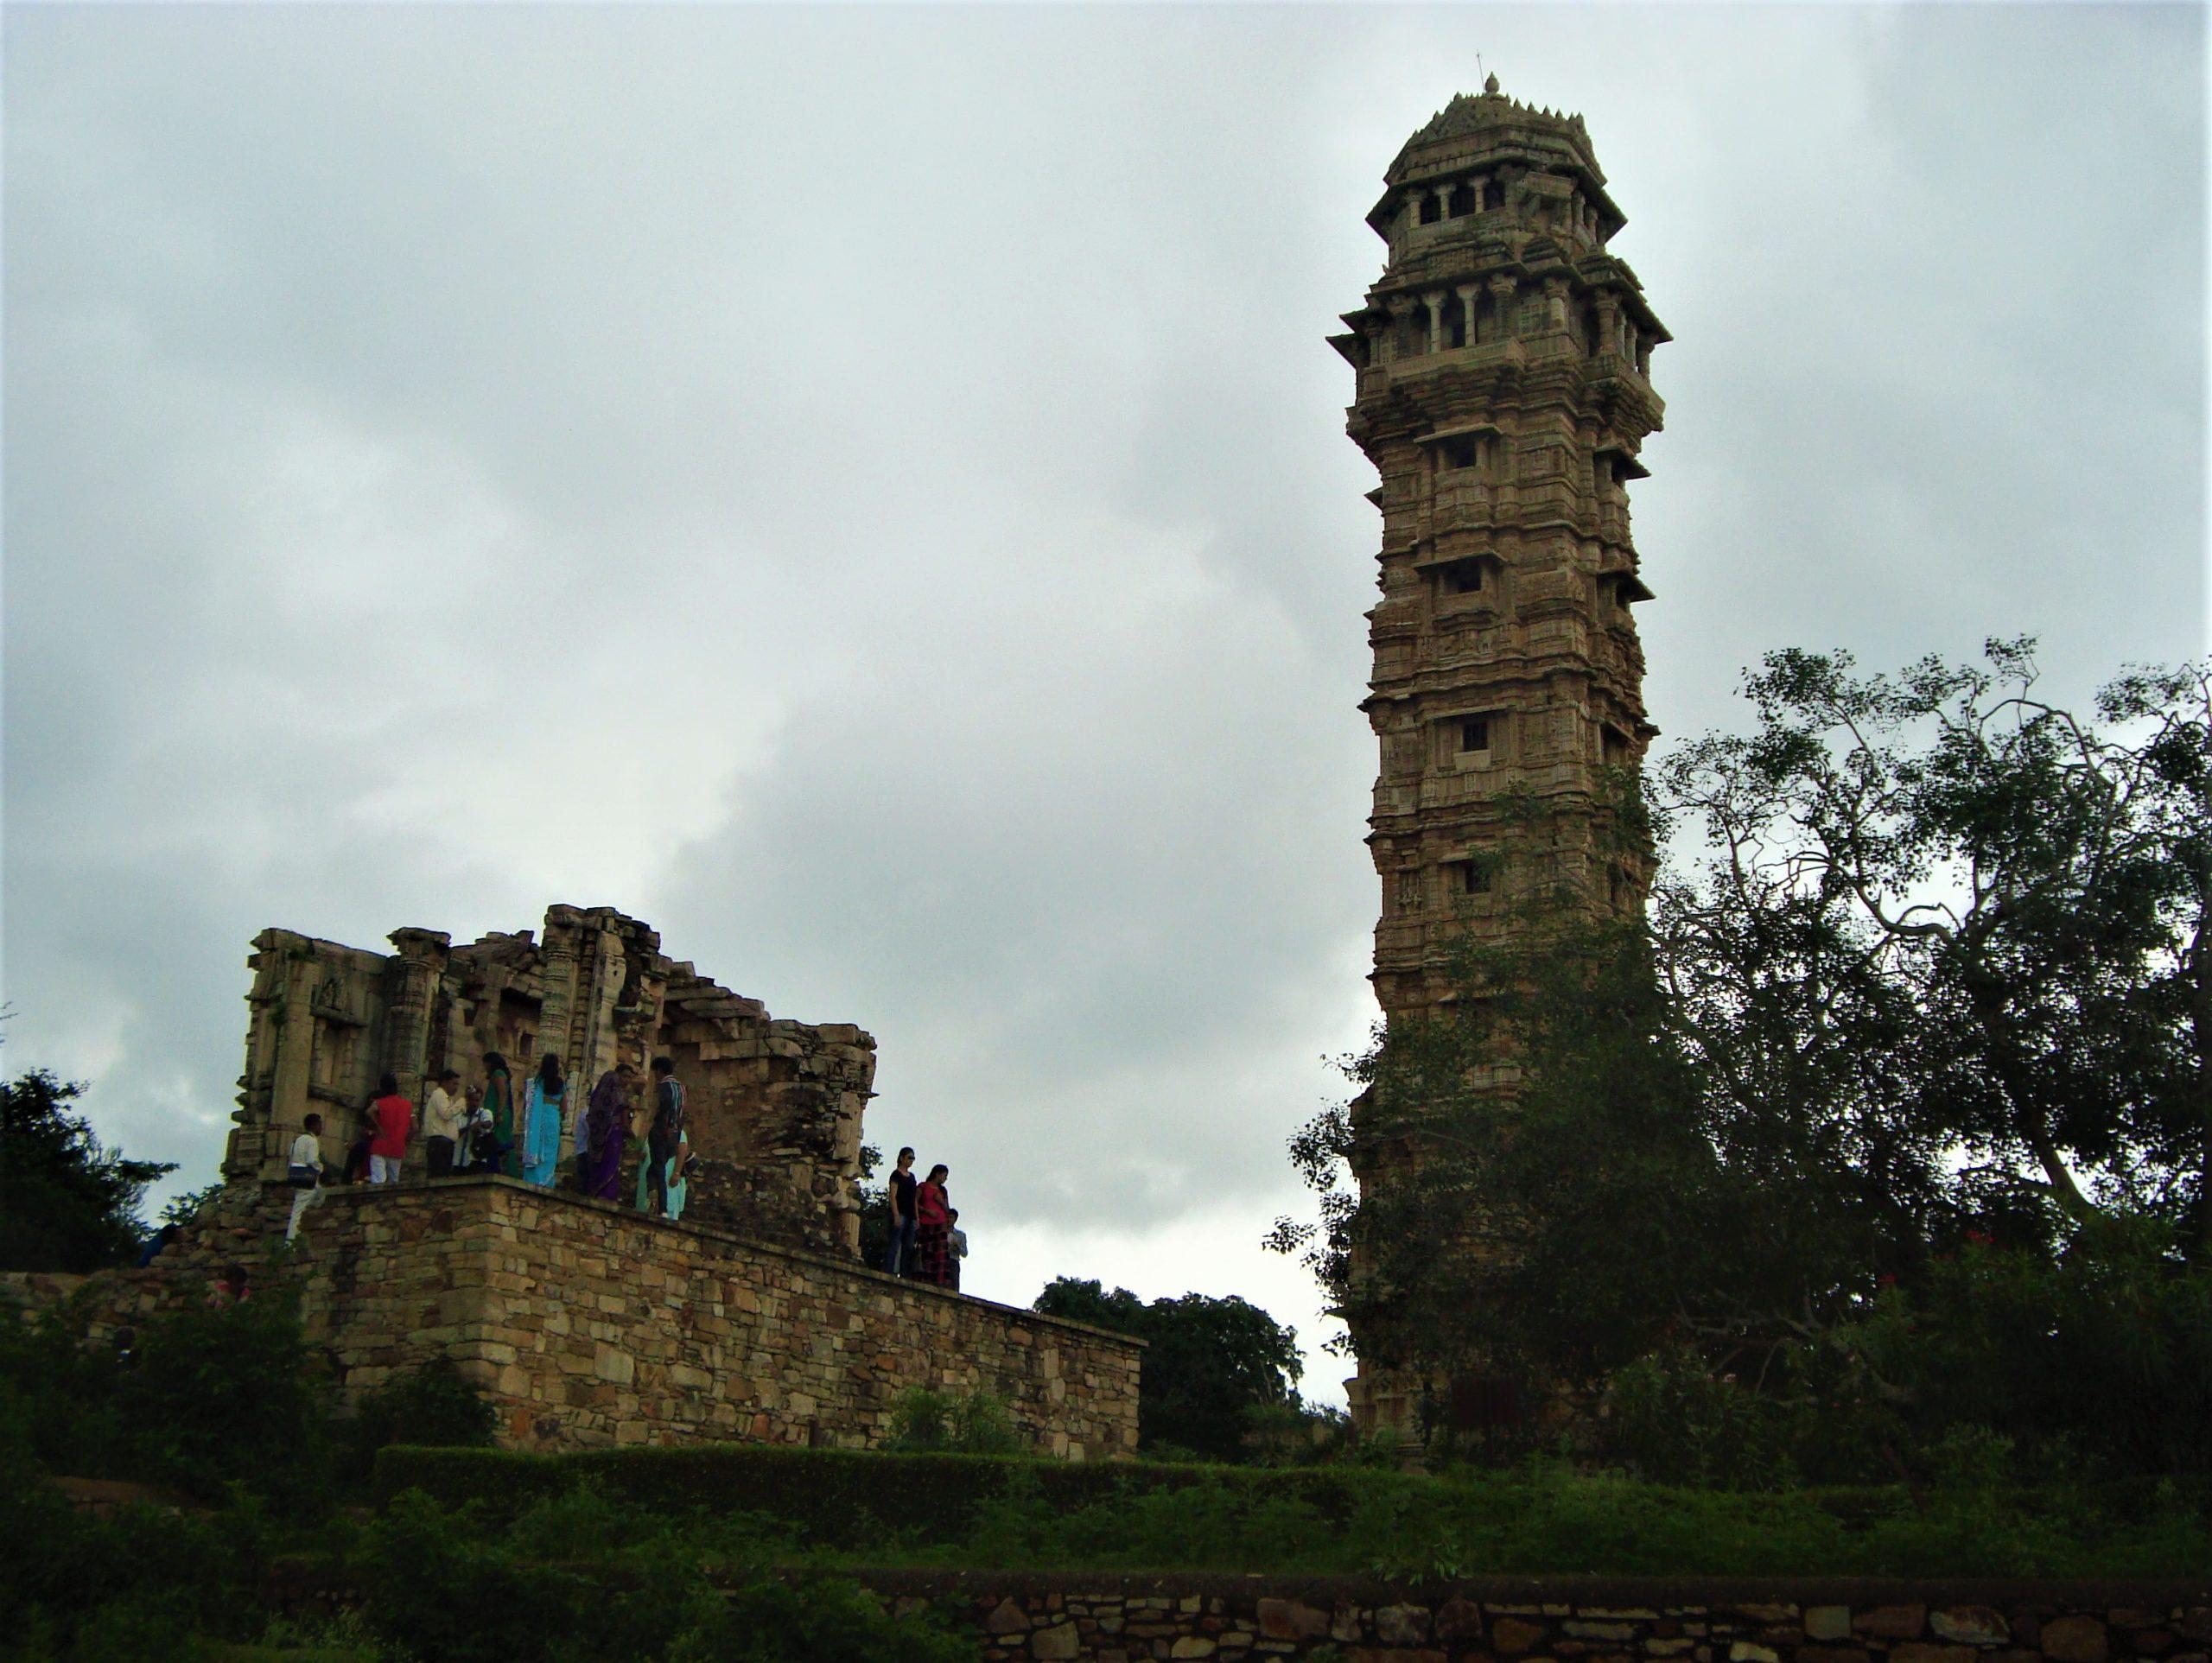 Tourists at Vijay Stambha, Chittogarh Fort, Rajasthan.